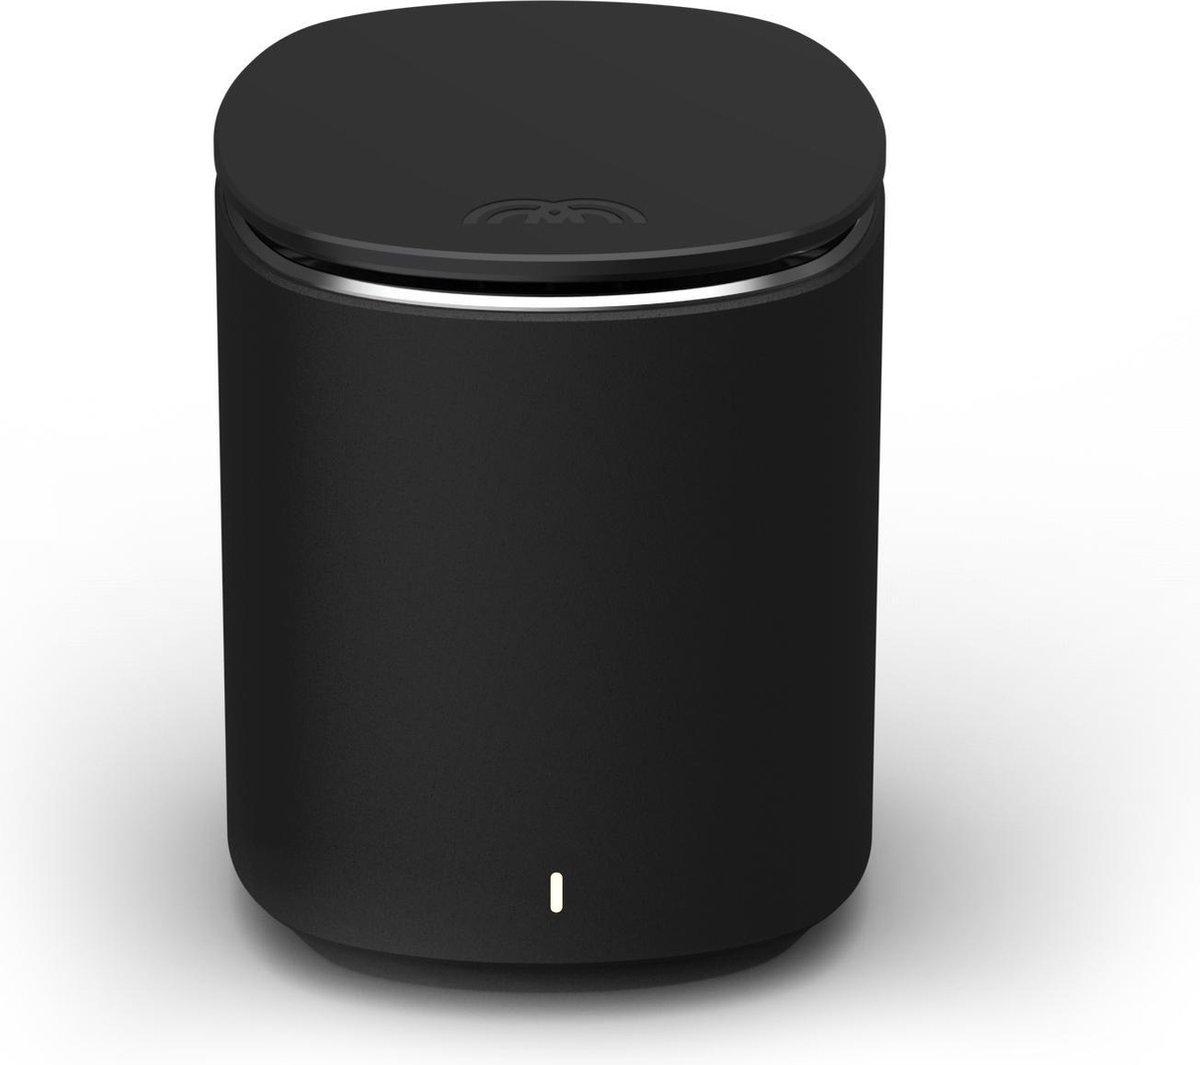 Mercku M2 Hive - Multiroom Mesh WiFi systeem